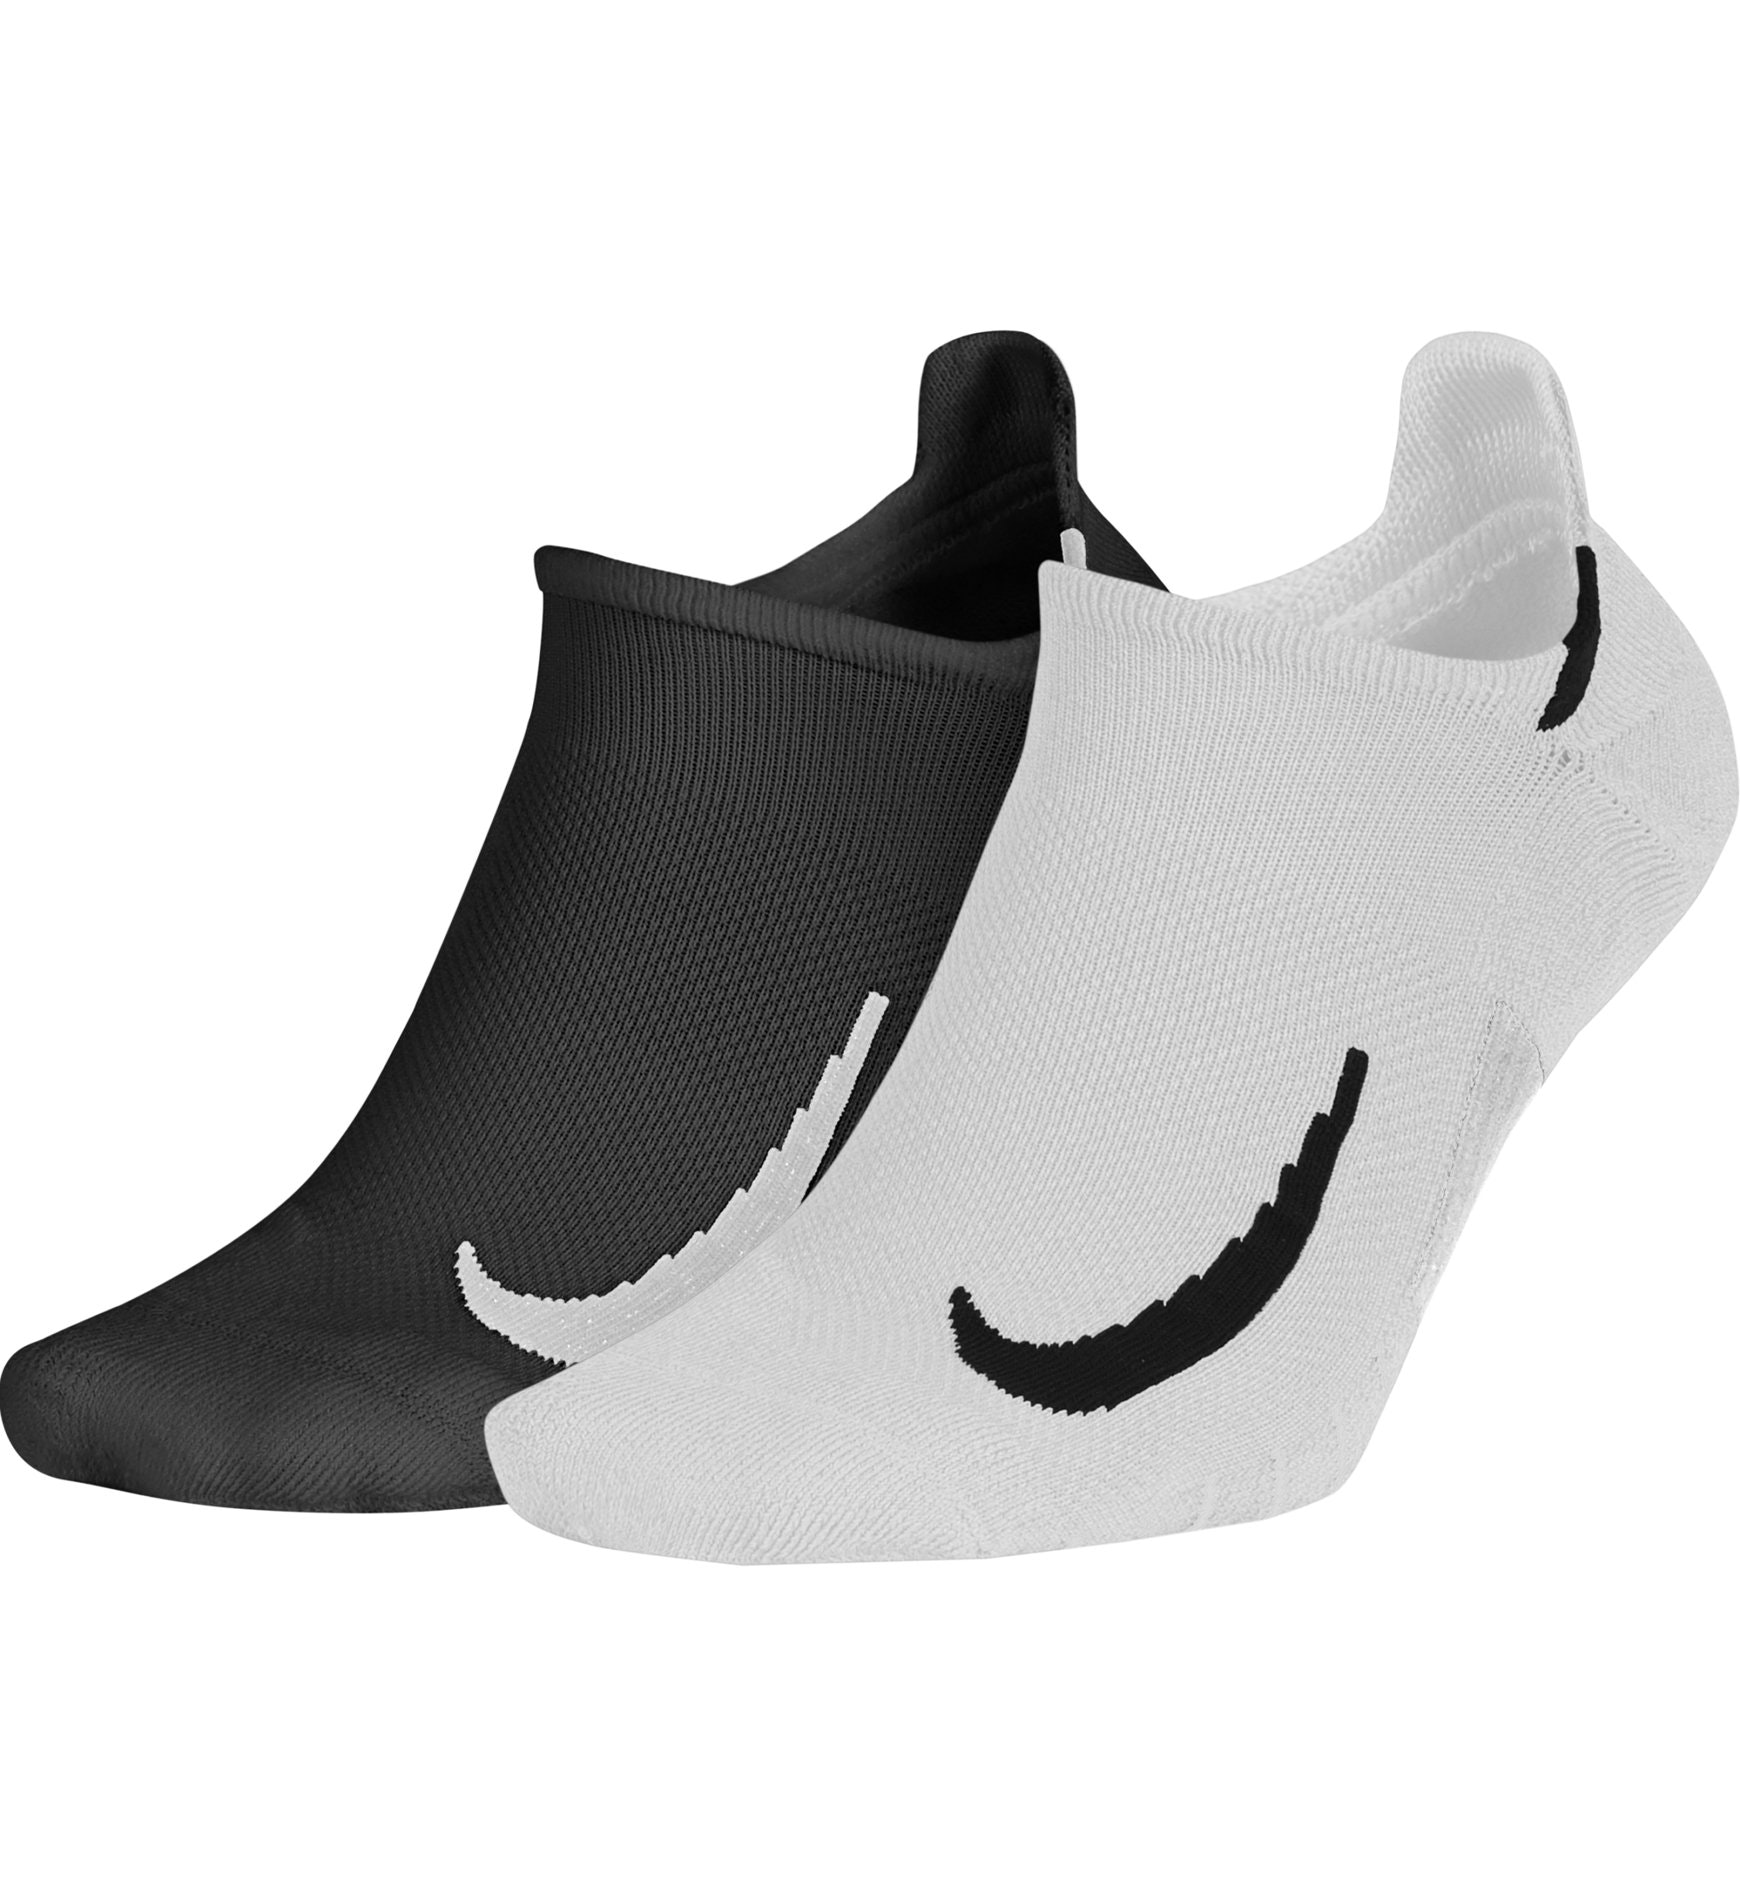 Nike Multiplier No-Show 2 pairs - calzini corti running - unisex